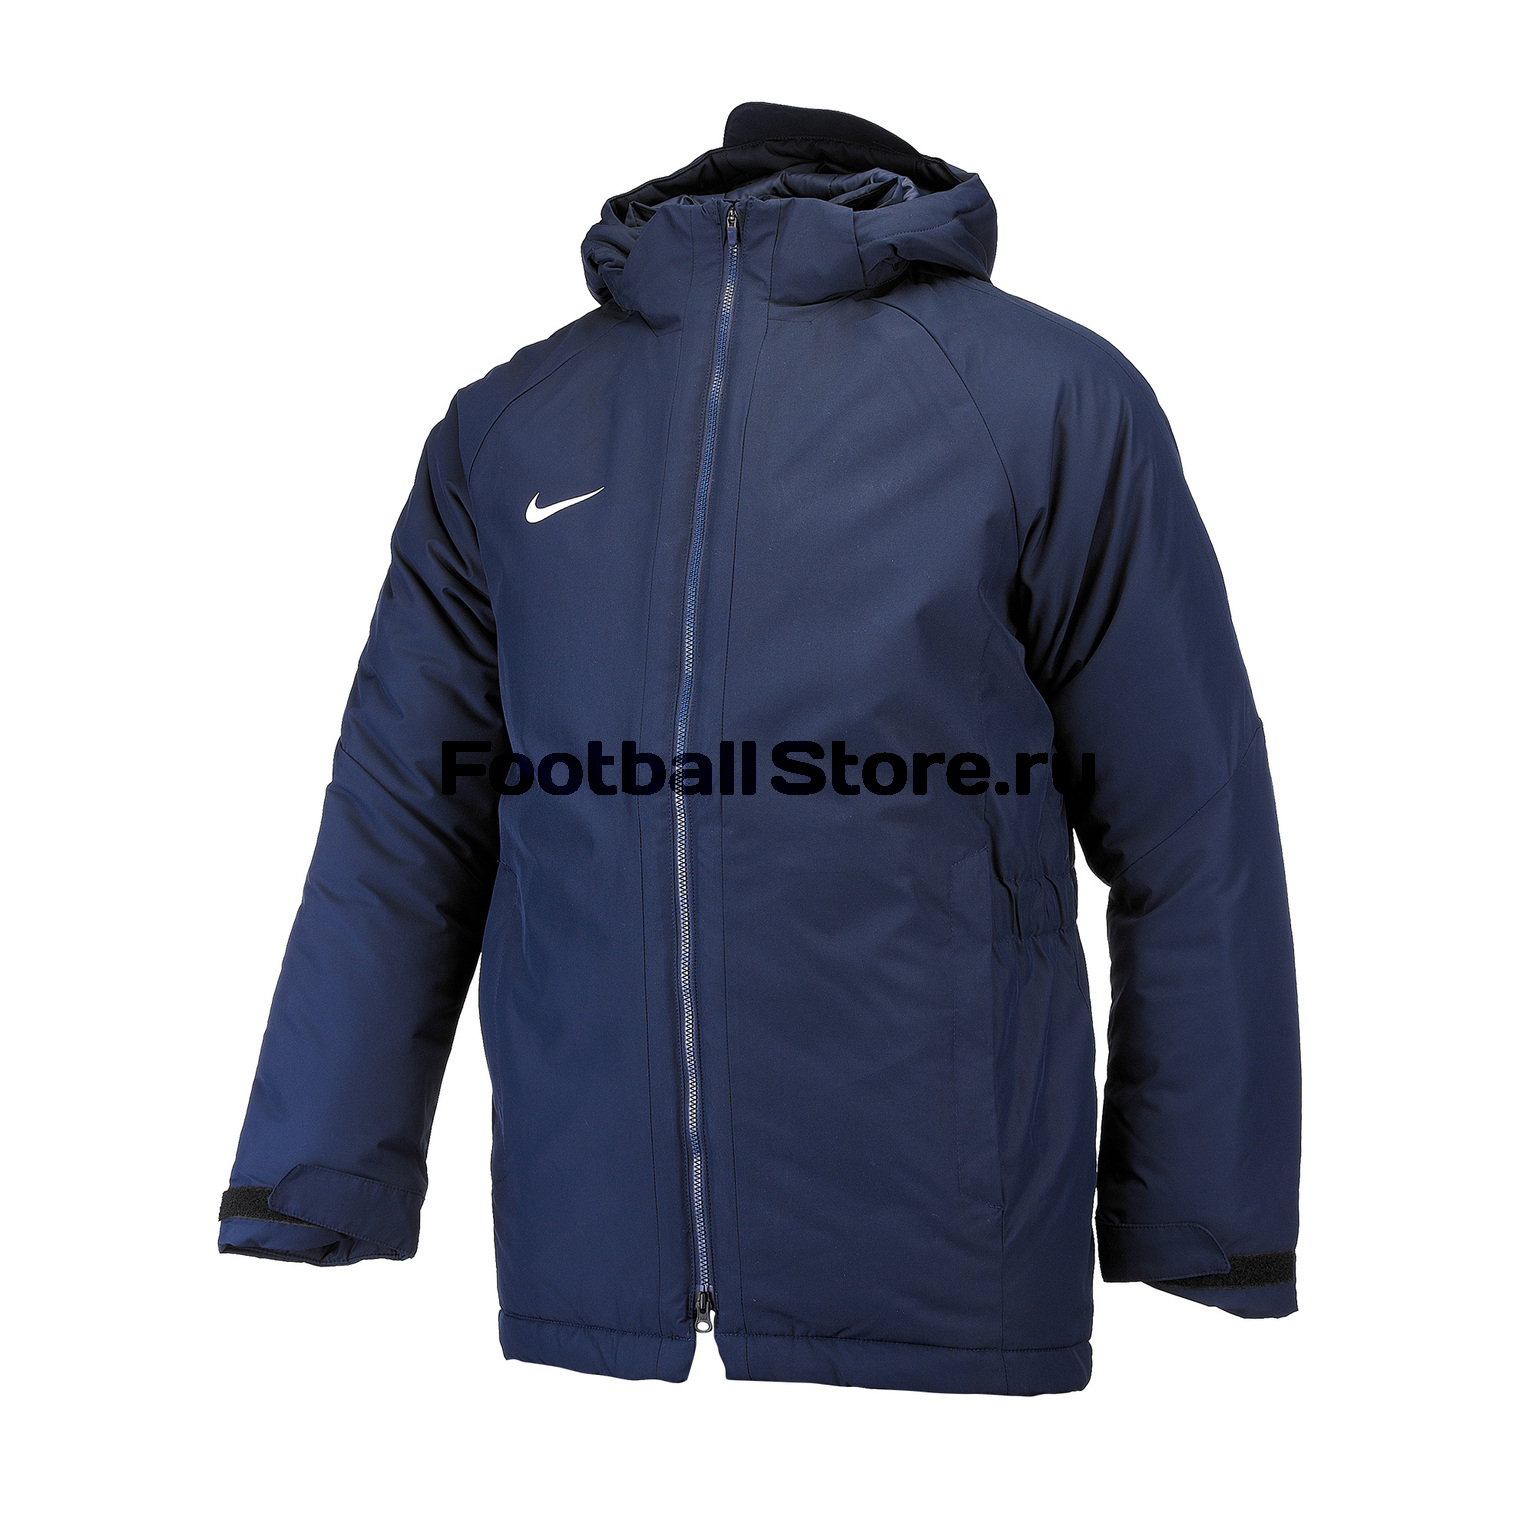 Куртка подростковая Nike Dry Academy18 Jacket 893827-451 цена